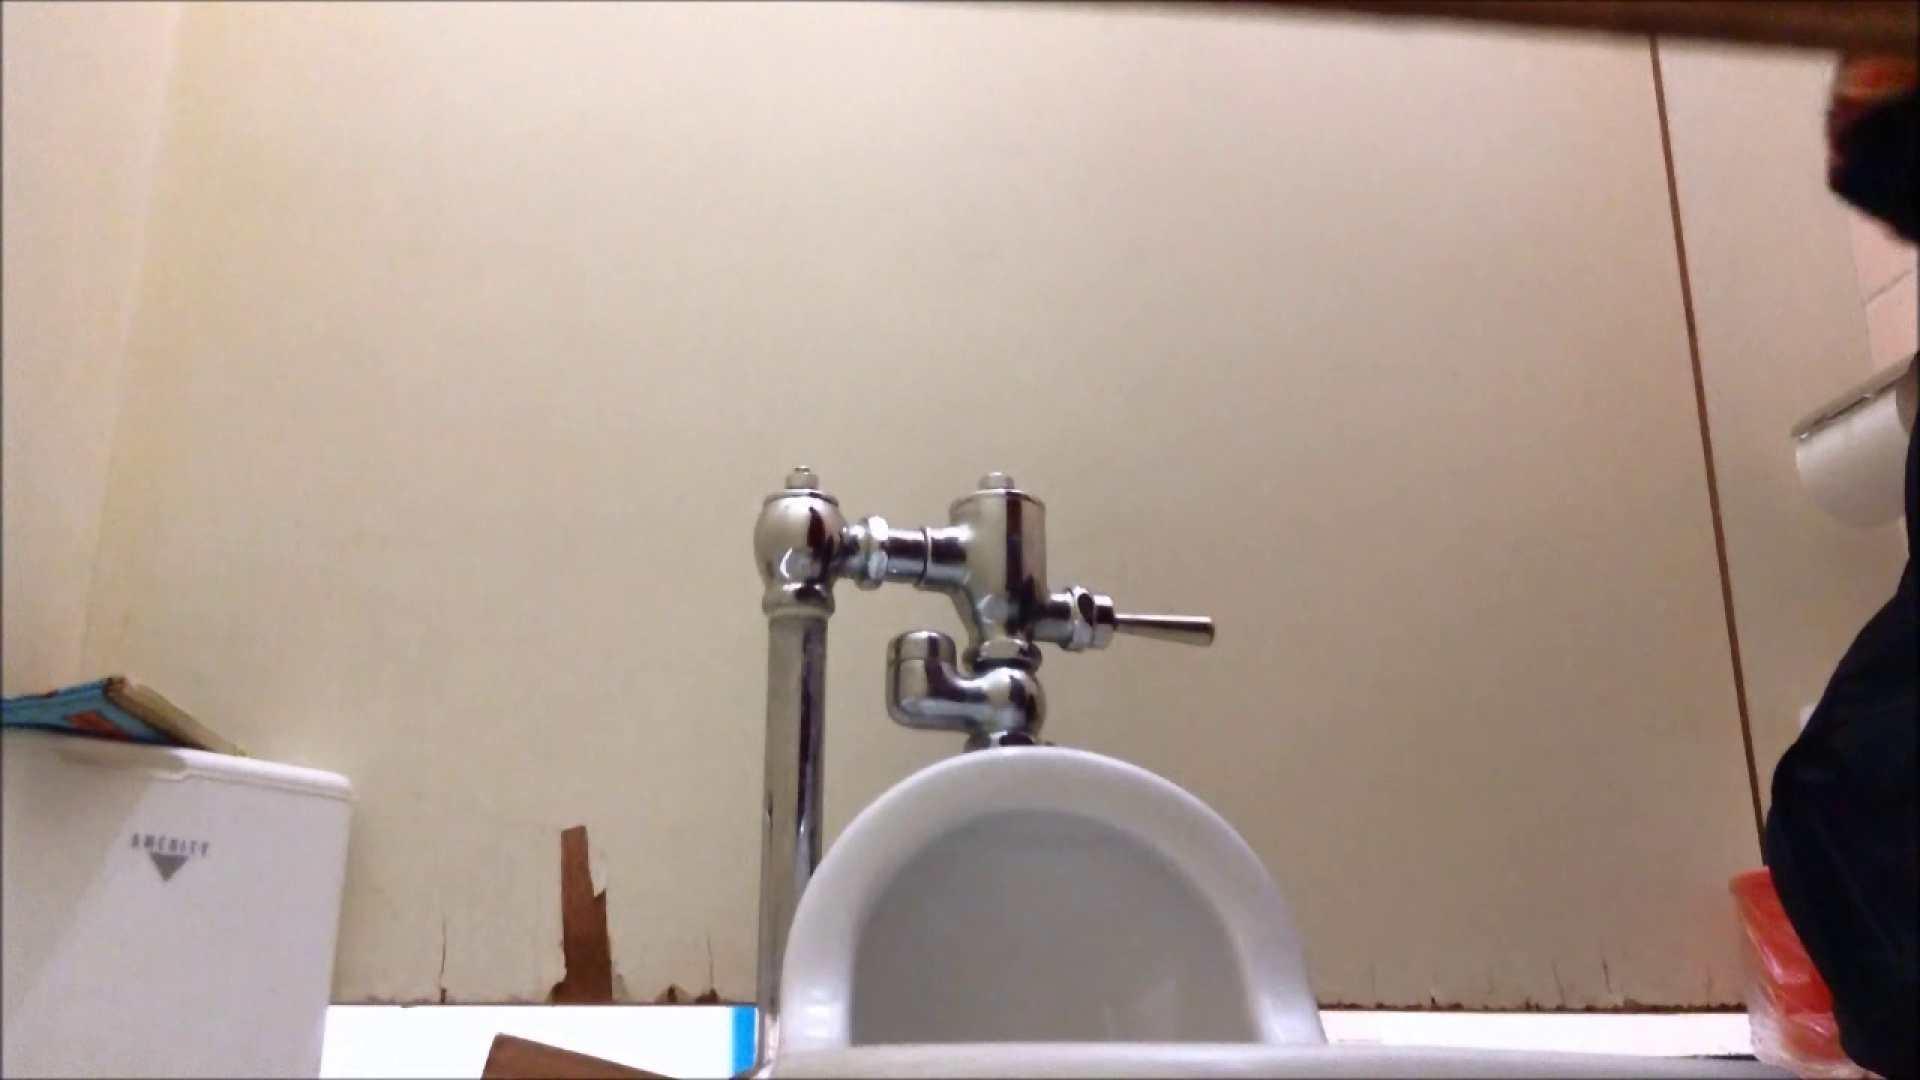 某有名大学女性洗面所 vol.06 OLのボディ オメコ無修正動画無料 74PIX 26